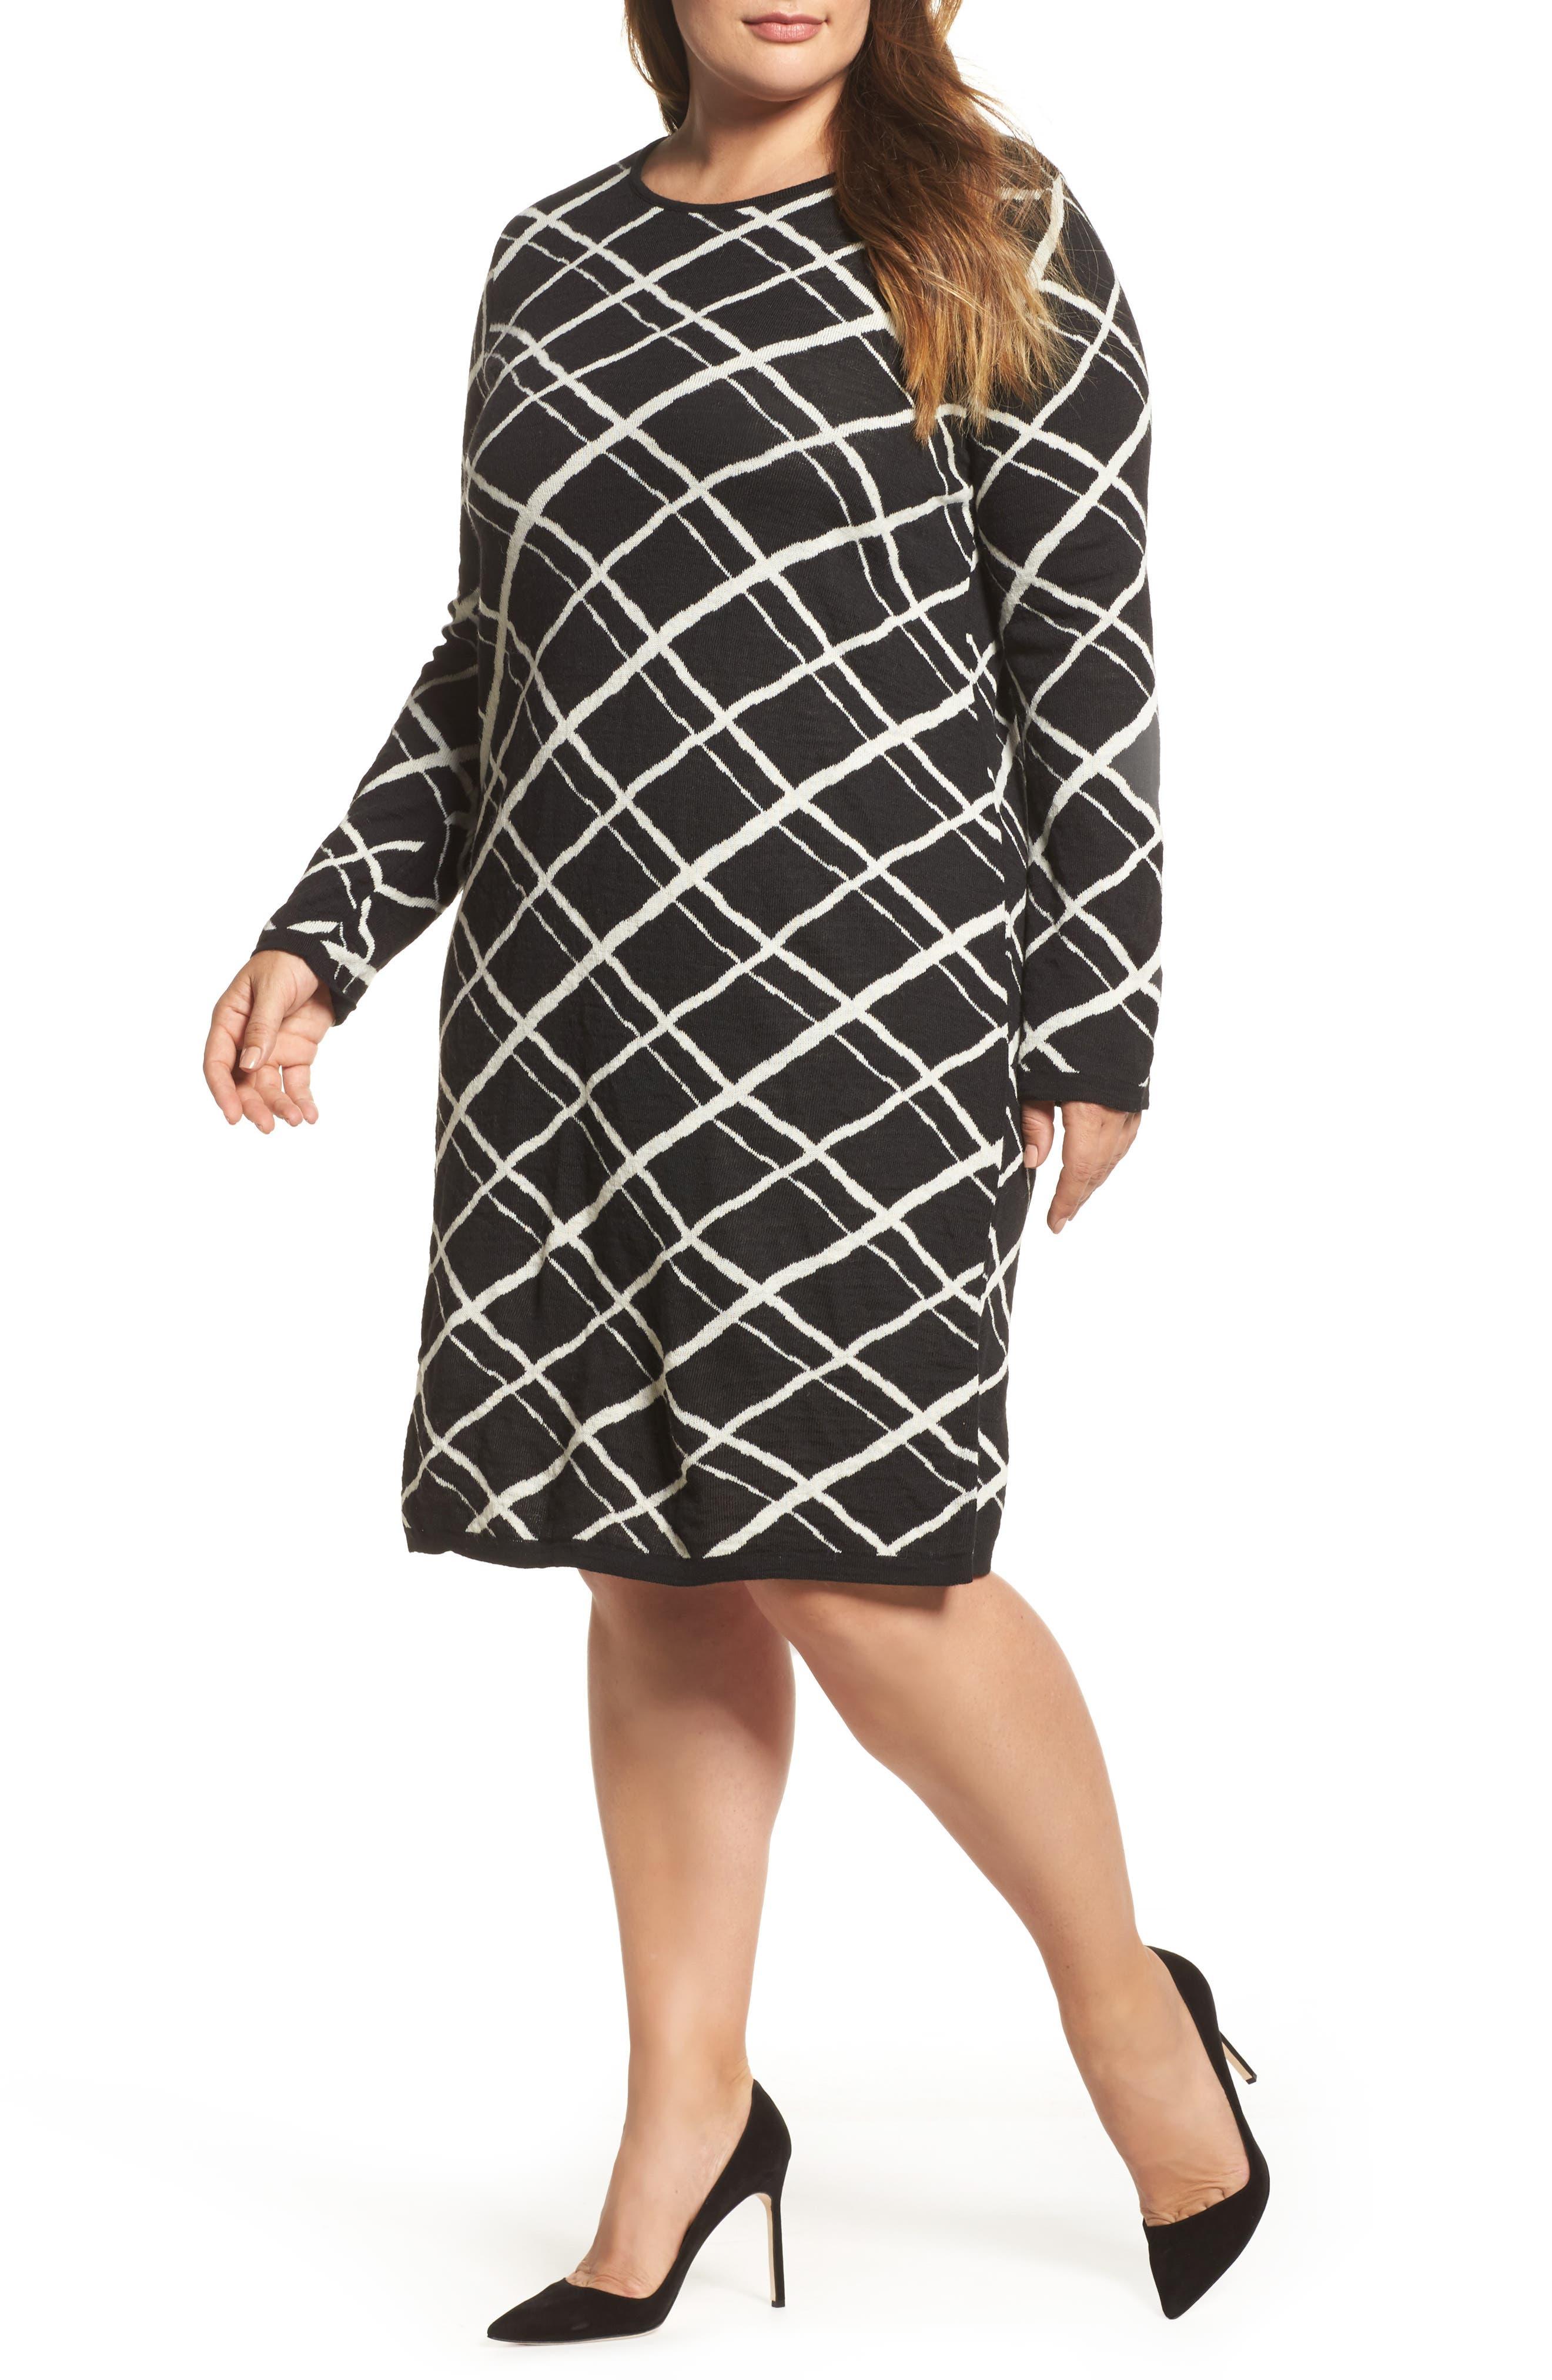 Alternate Image 1 Selected - Persona by Marina Rinaldi Genesi Checkered Knit Dress (Plus Size)